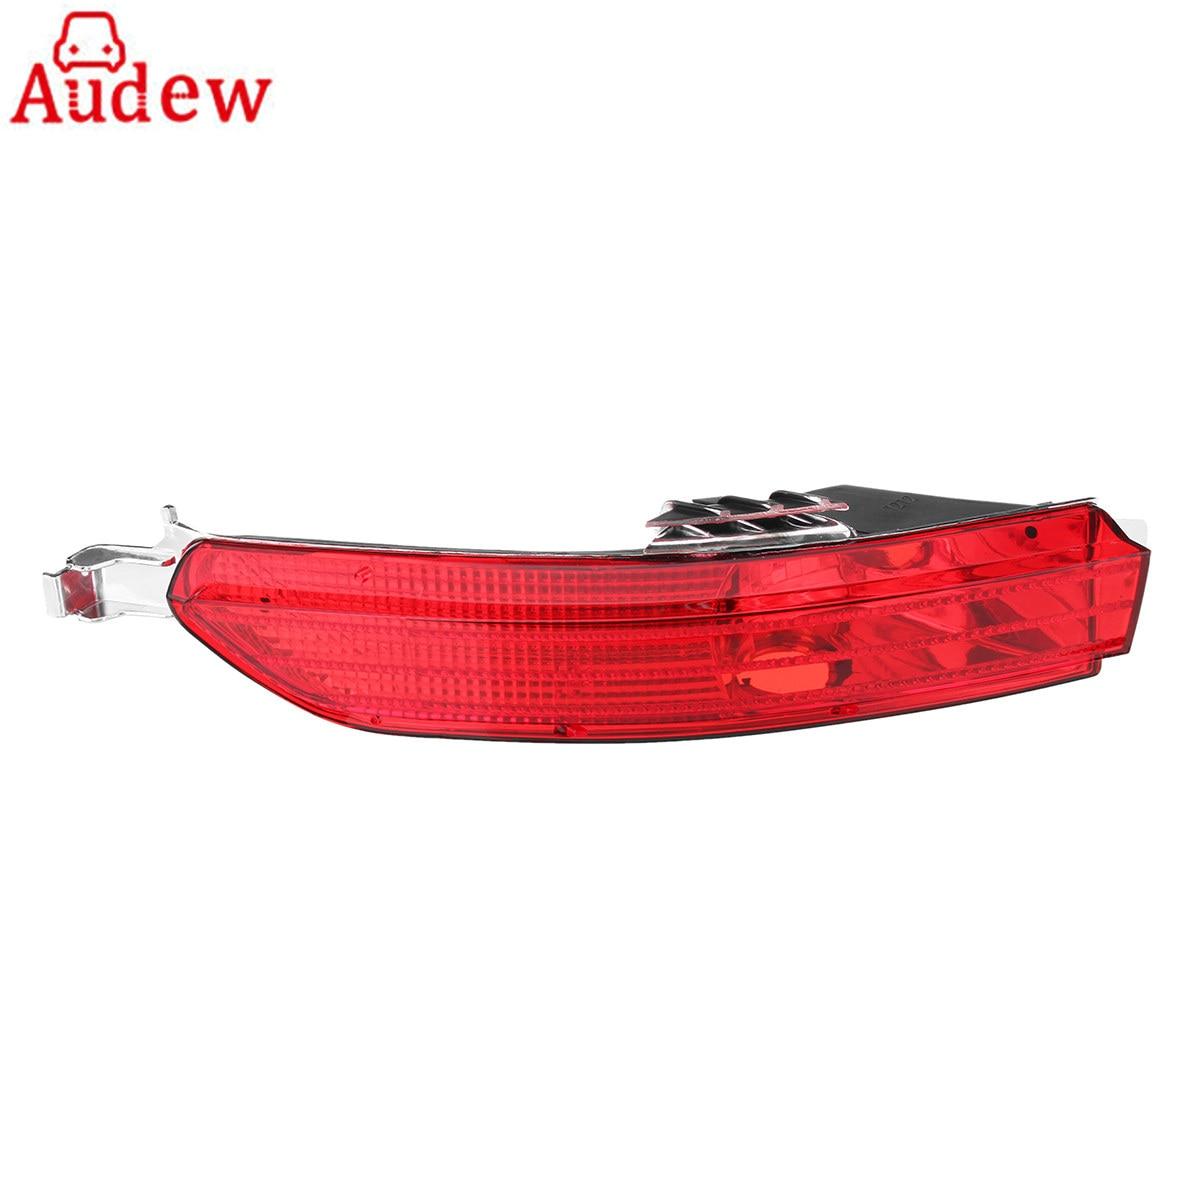 1Pcs Red Car Tail Light Turn Signal Lamp Left Rear Bumper Red Fog Light For VW TOUAREG 11 14